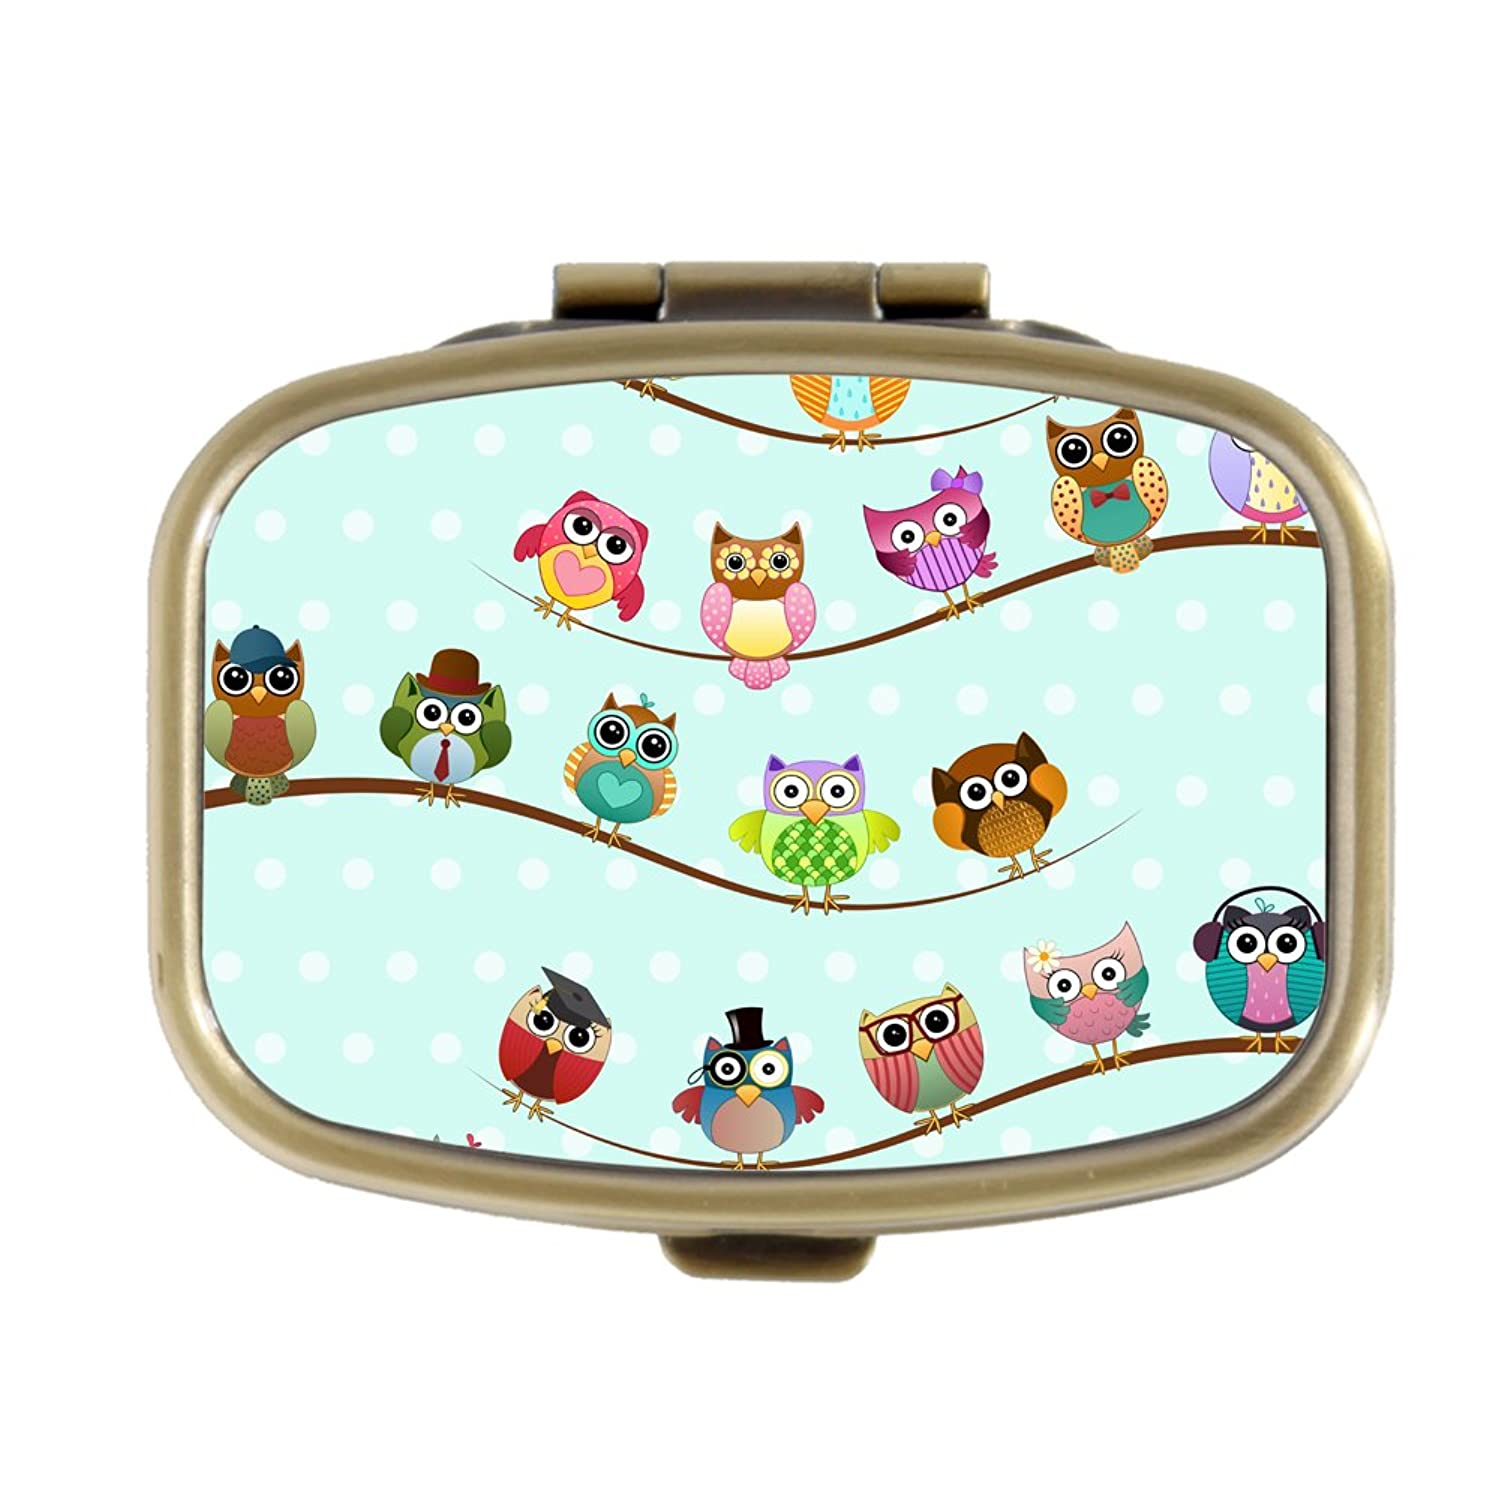 Cute Owls On Branches Custom Fashion Bronze Tone Rectangular Pill Box Medicine Tablet Holder Wallet Organizer Case for Pocket or Purse